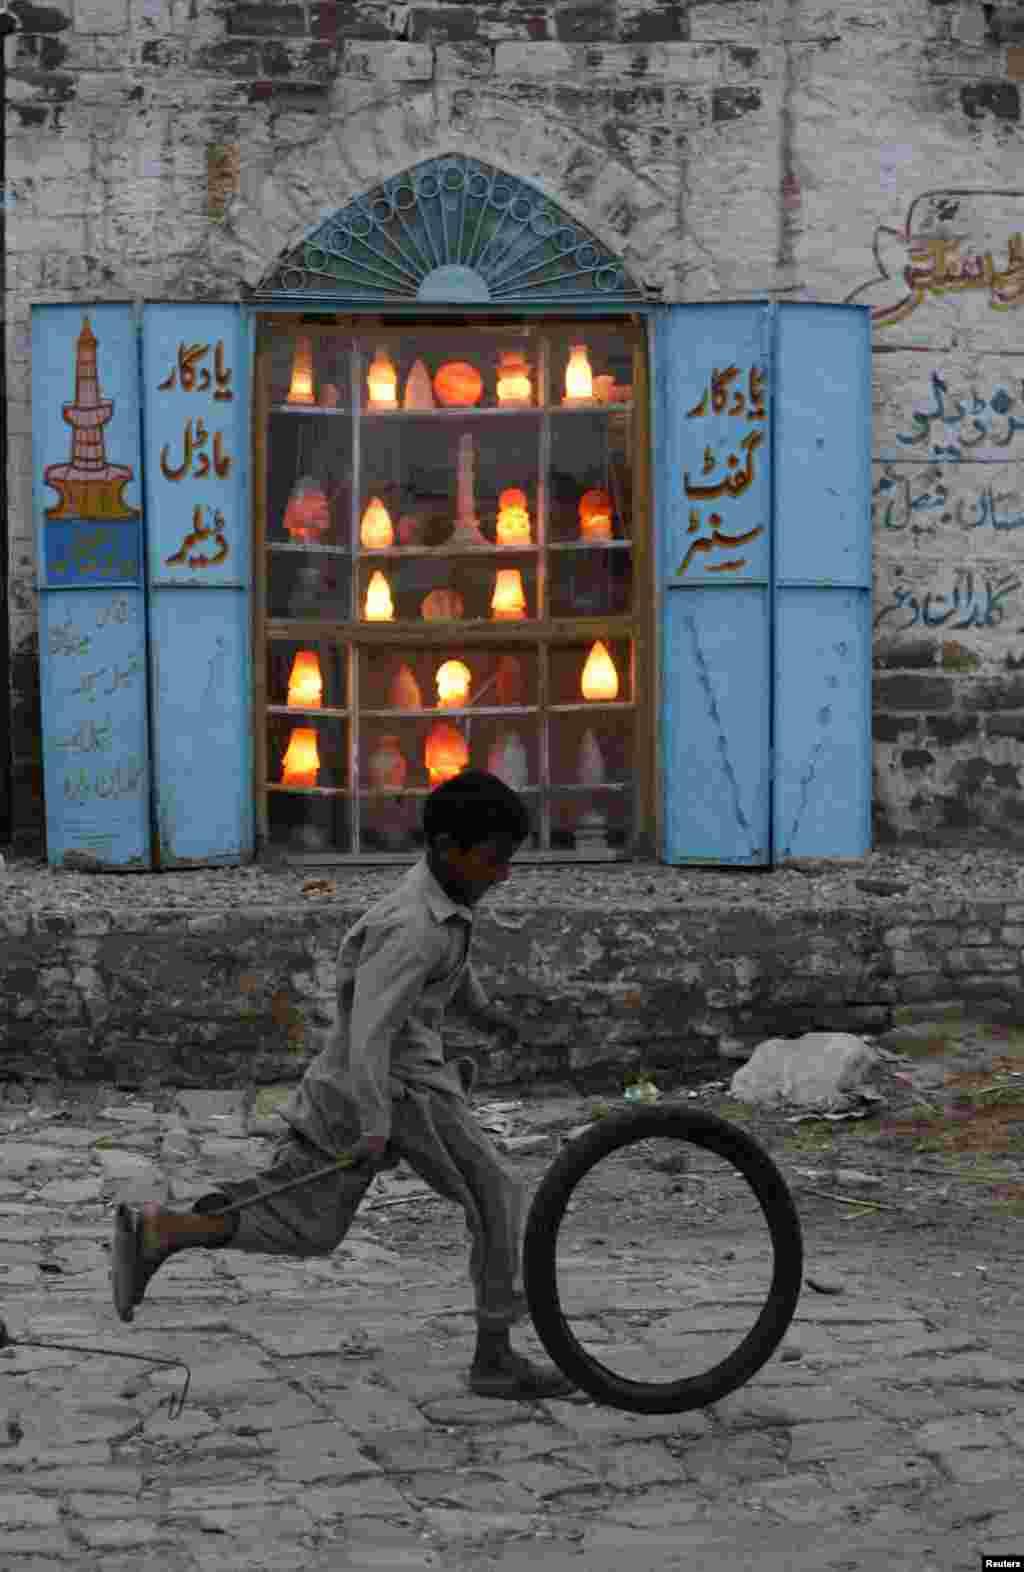 A Pakistani boy runs past a shop selling lamps and decoration pieces.